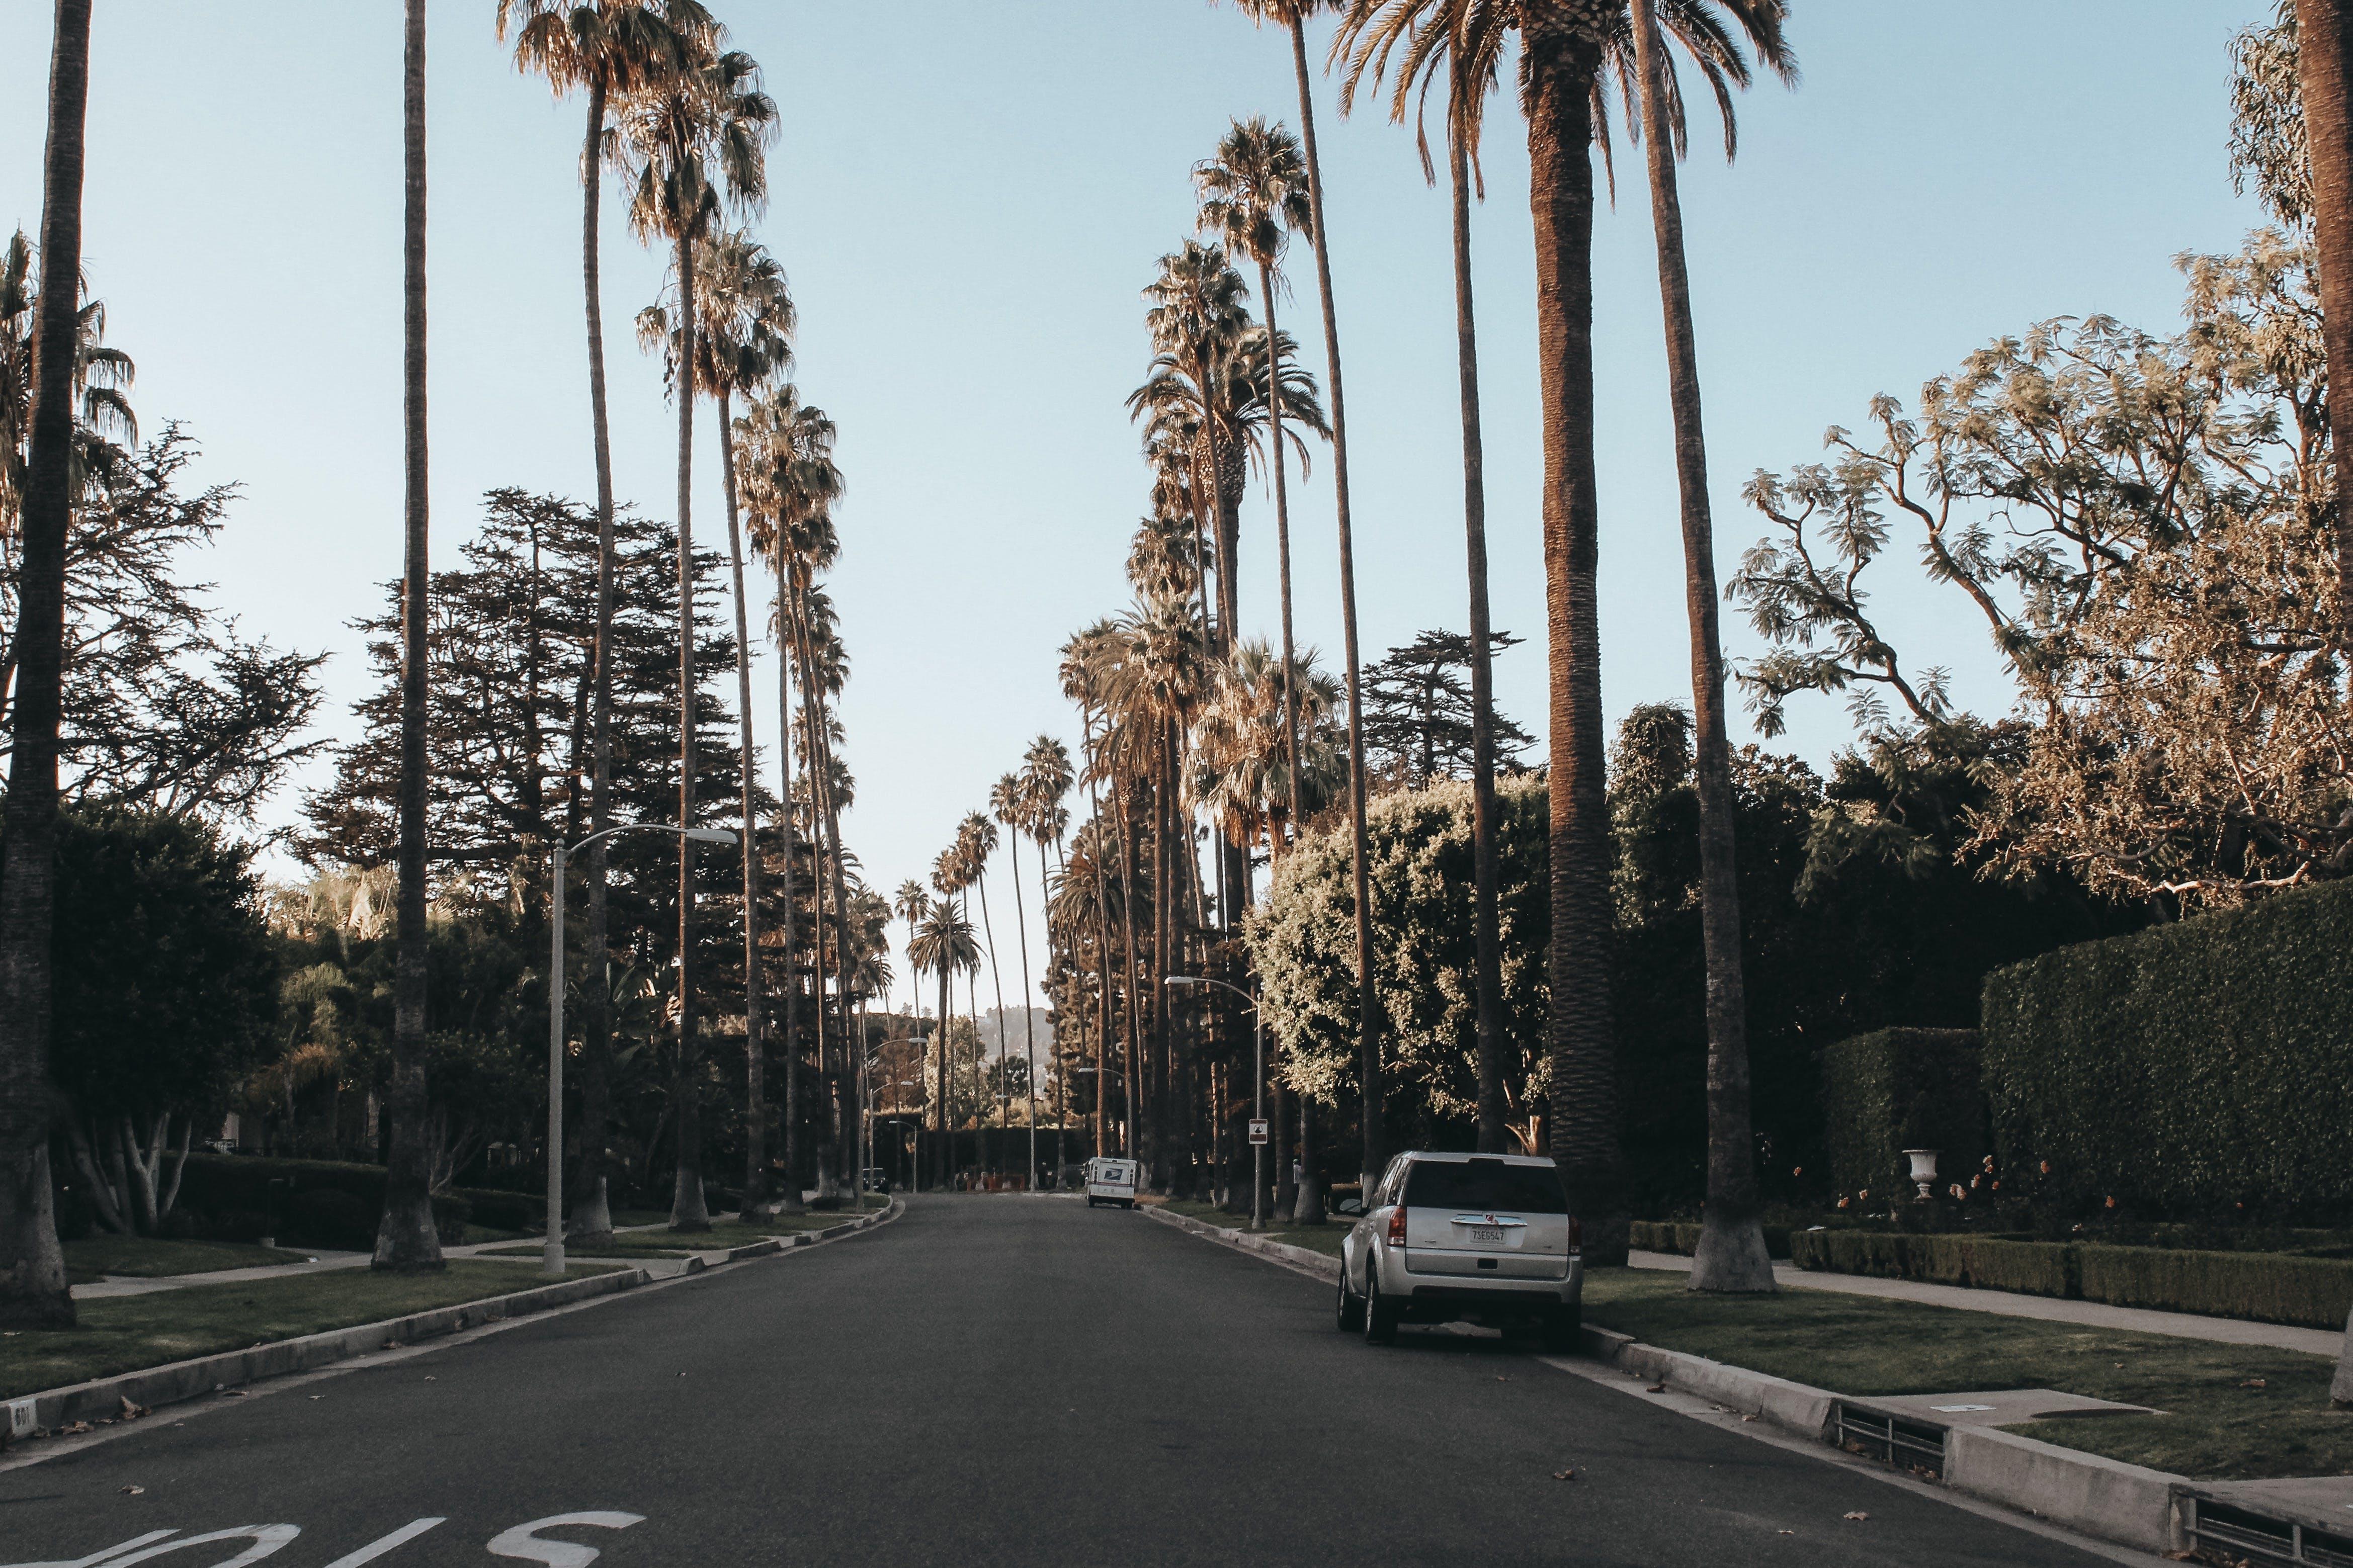 Kostenloses Stock Foto zu asphalt, auto, bäume, dämmerung